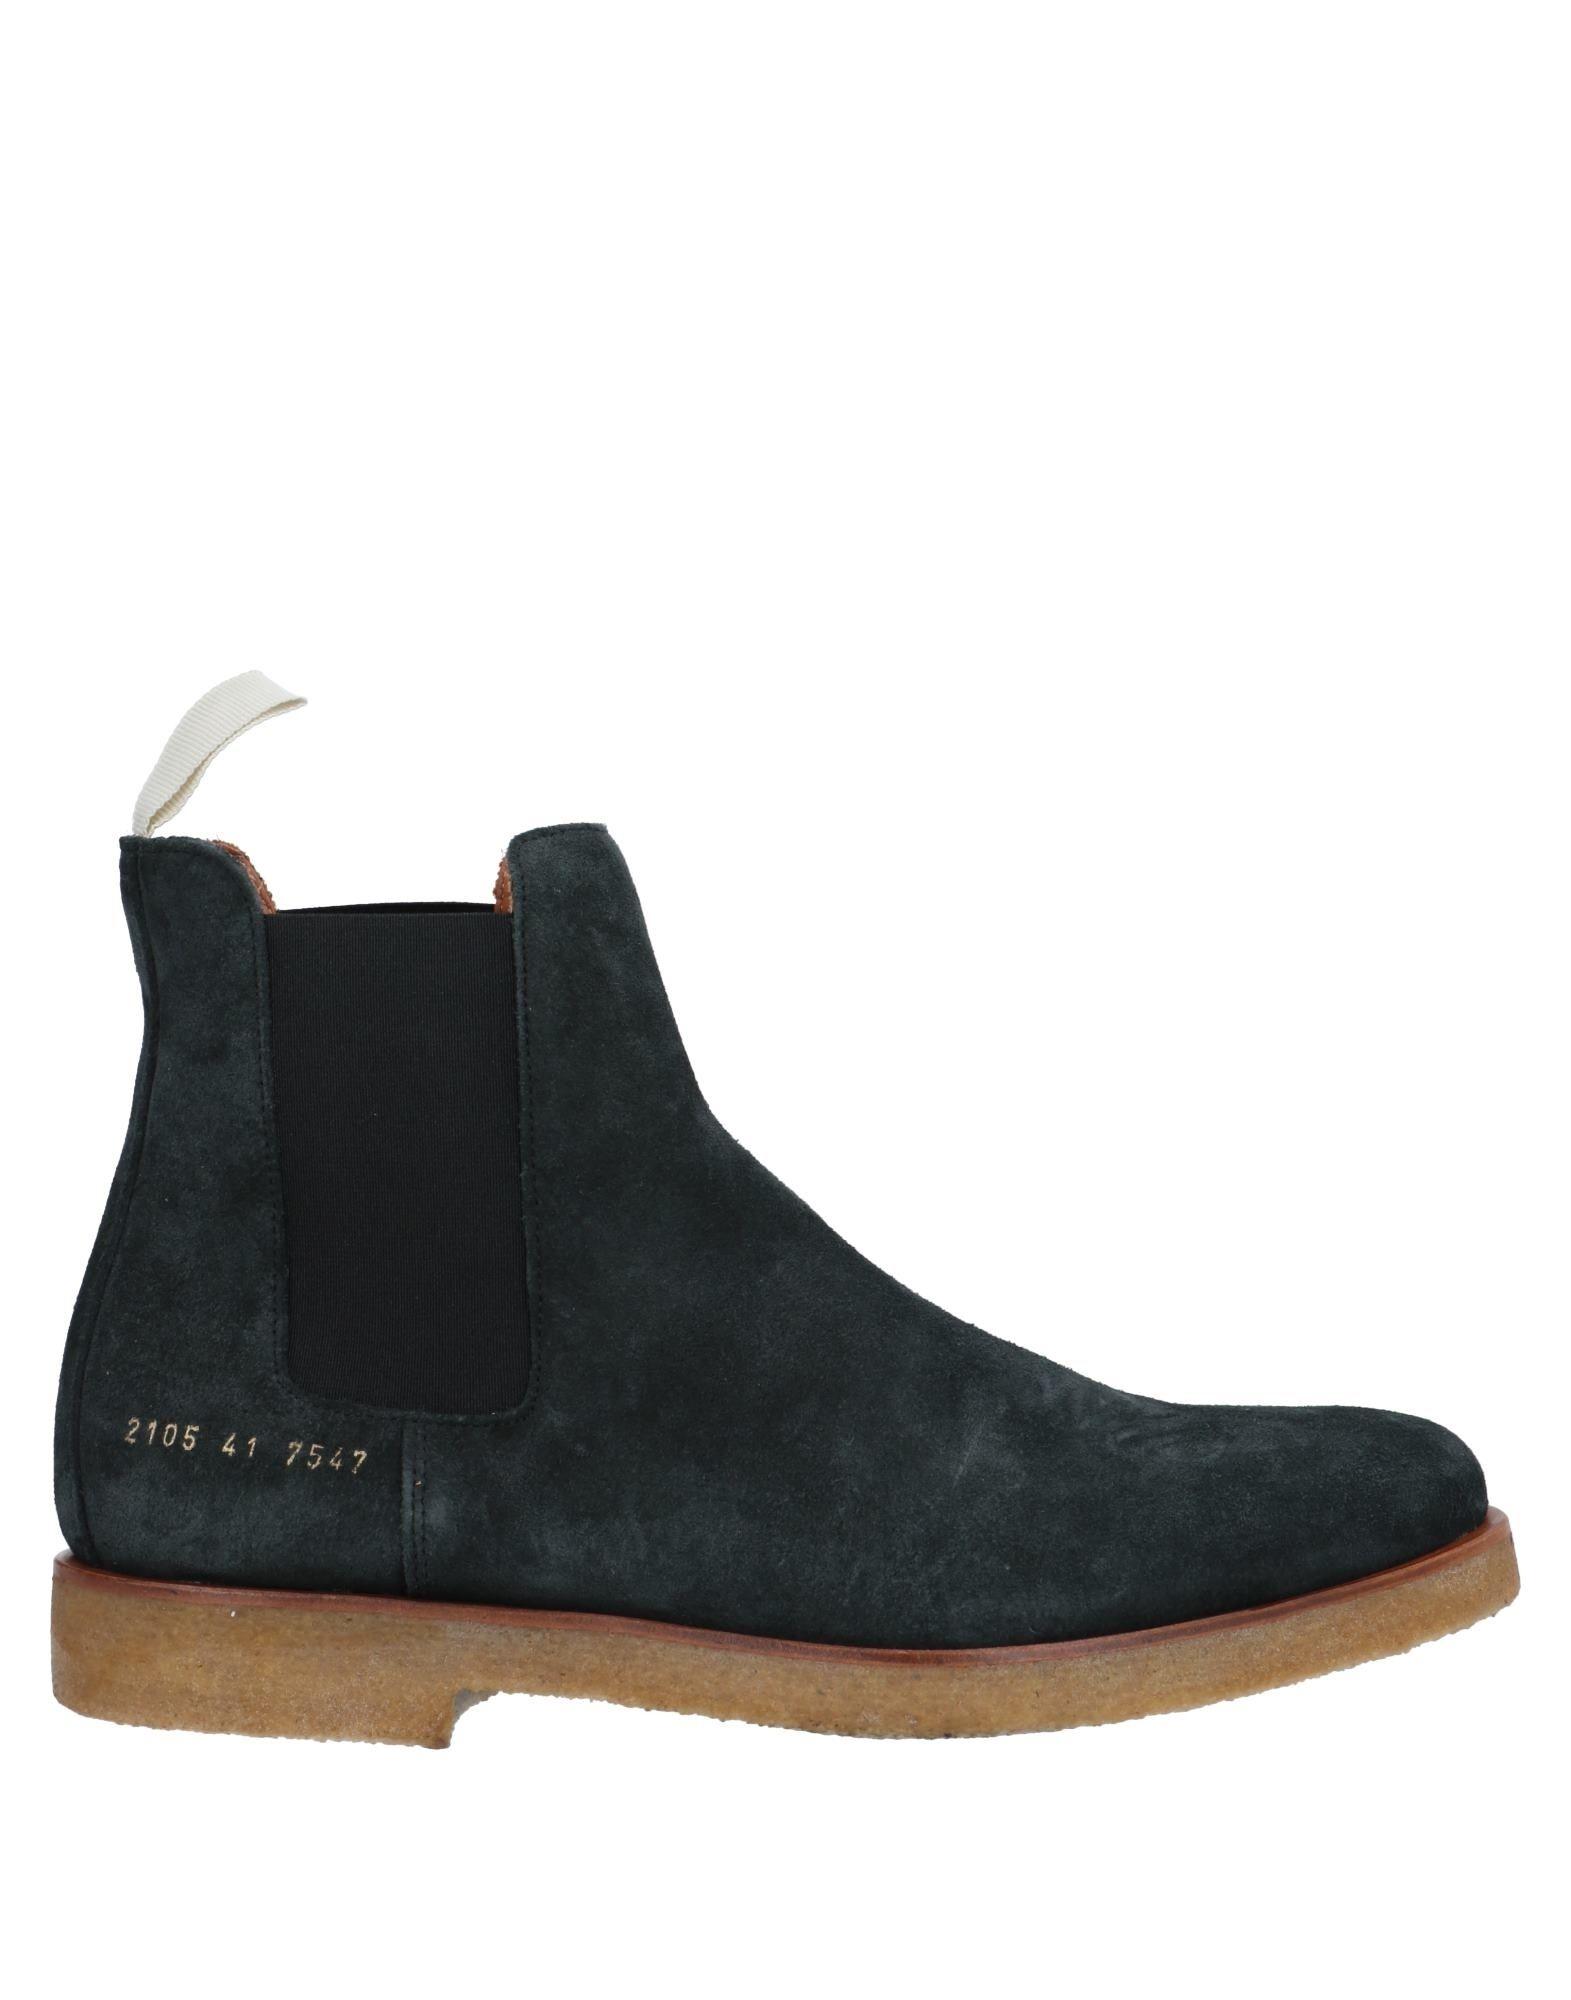 COMMON PROJECTS Полусапоги и высокие ботинки демисезонные ботинки common projects obscure achilles mesh low grey page 2 page 1